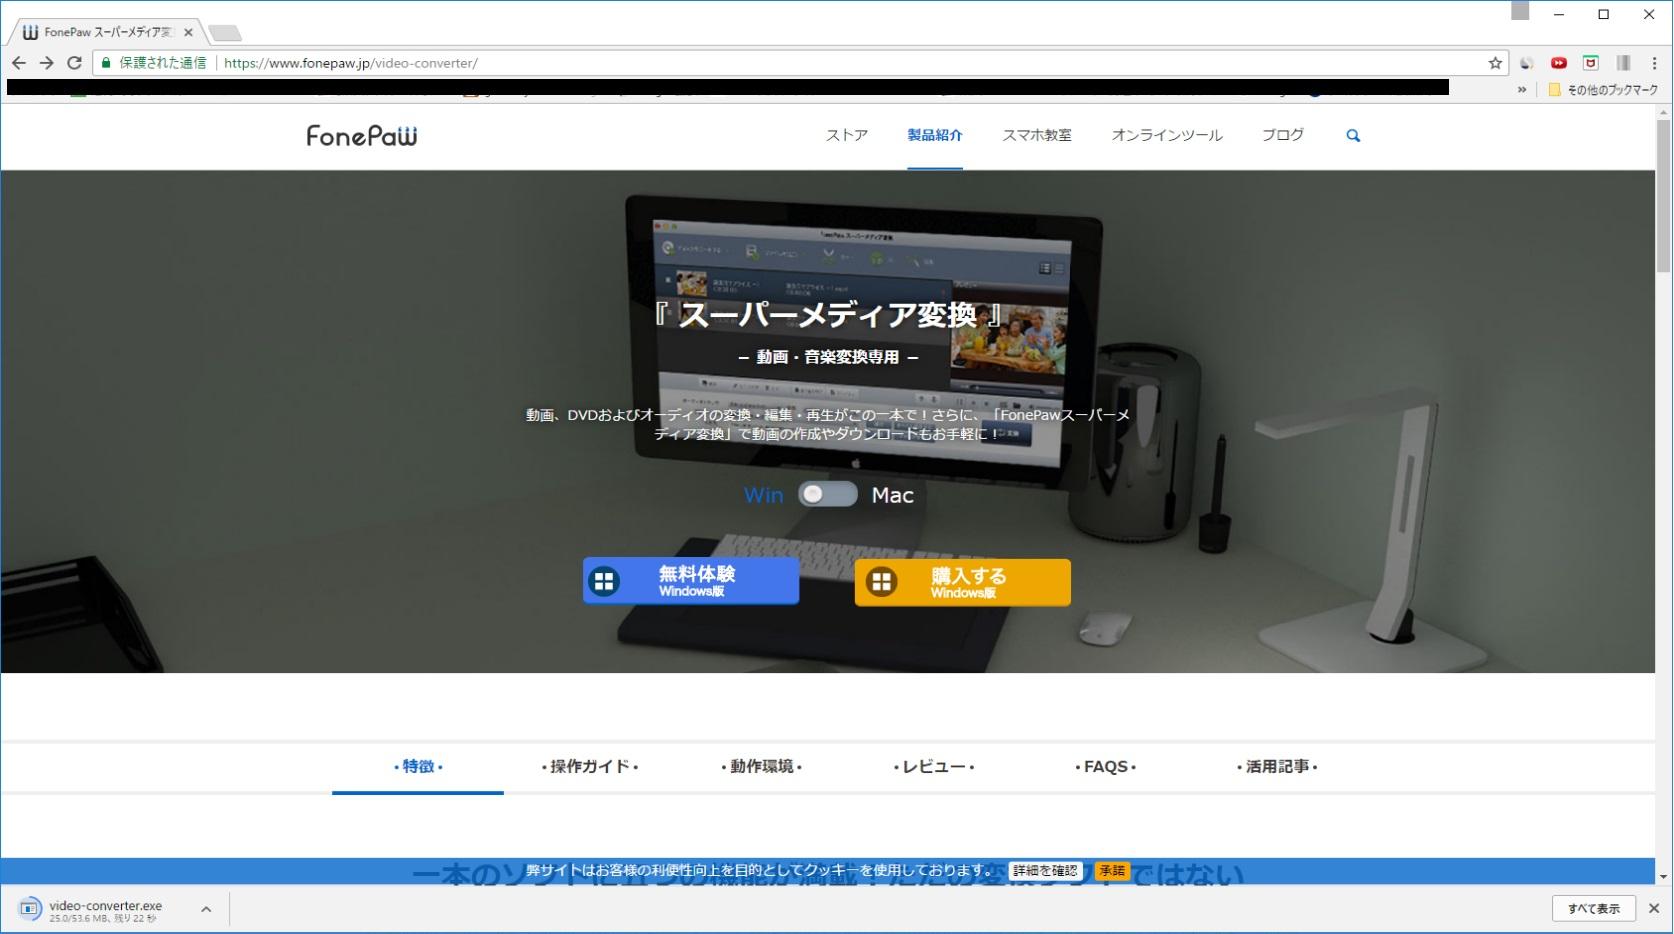 スーパーメディア変換3